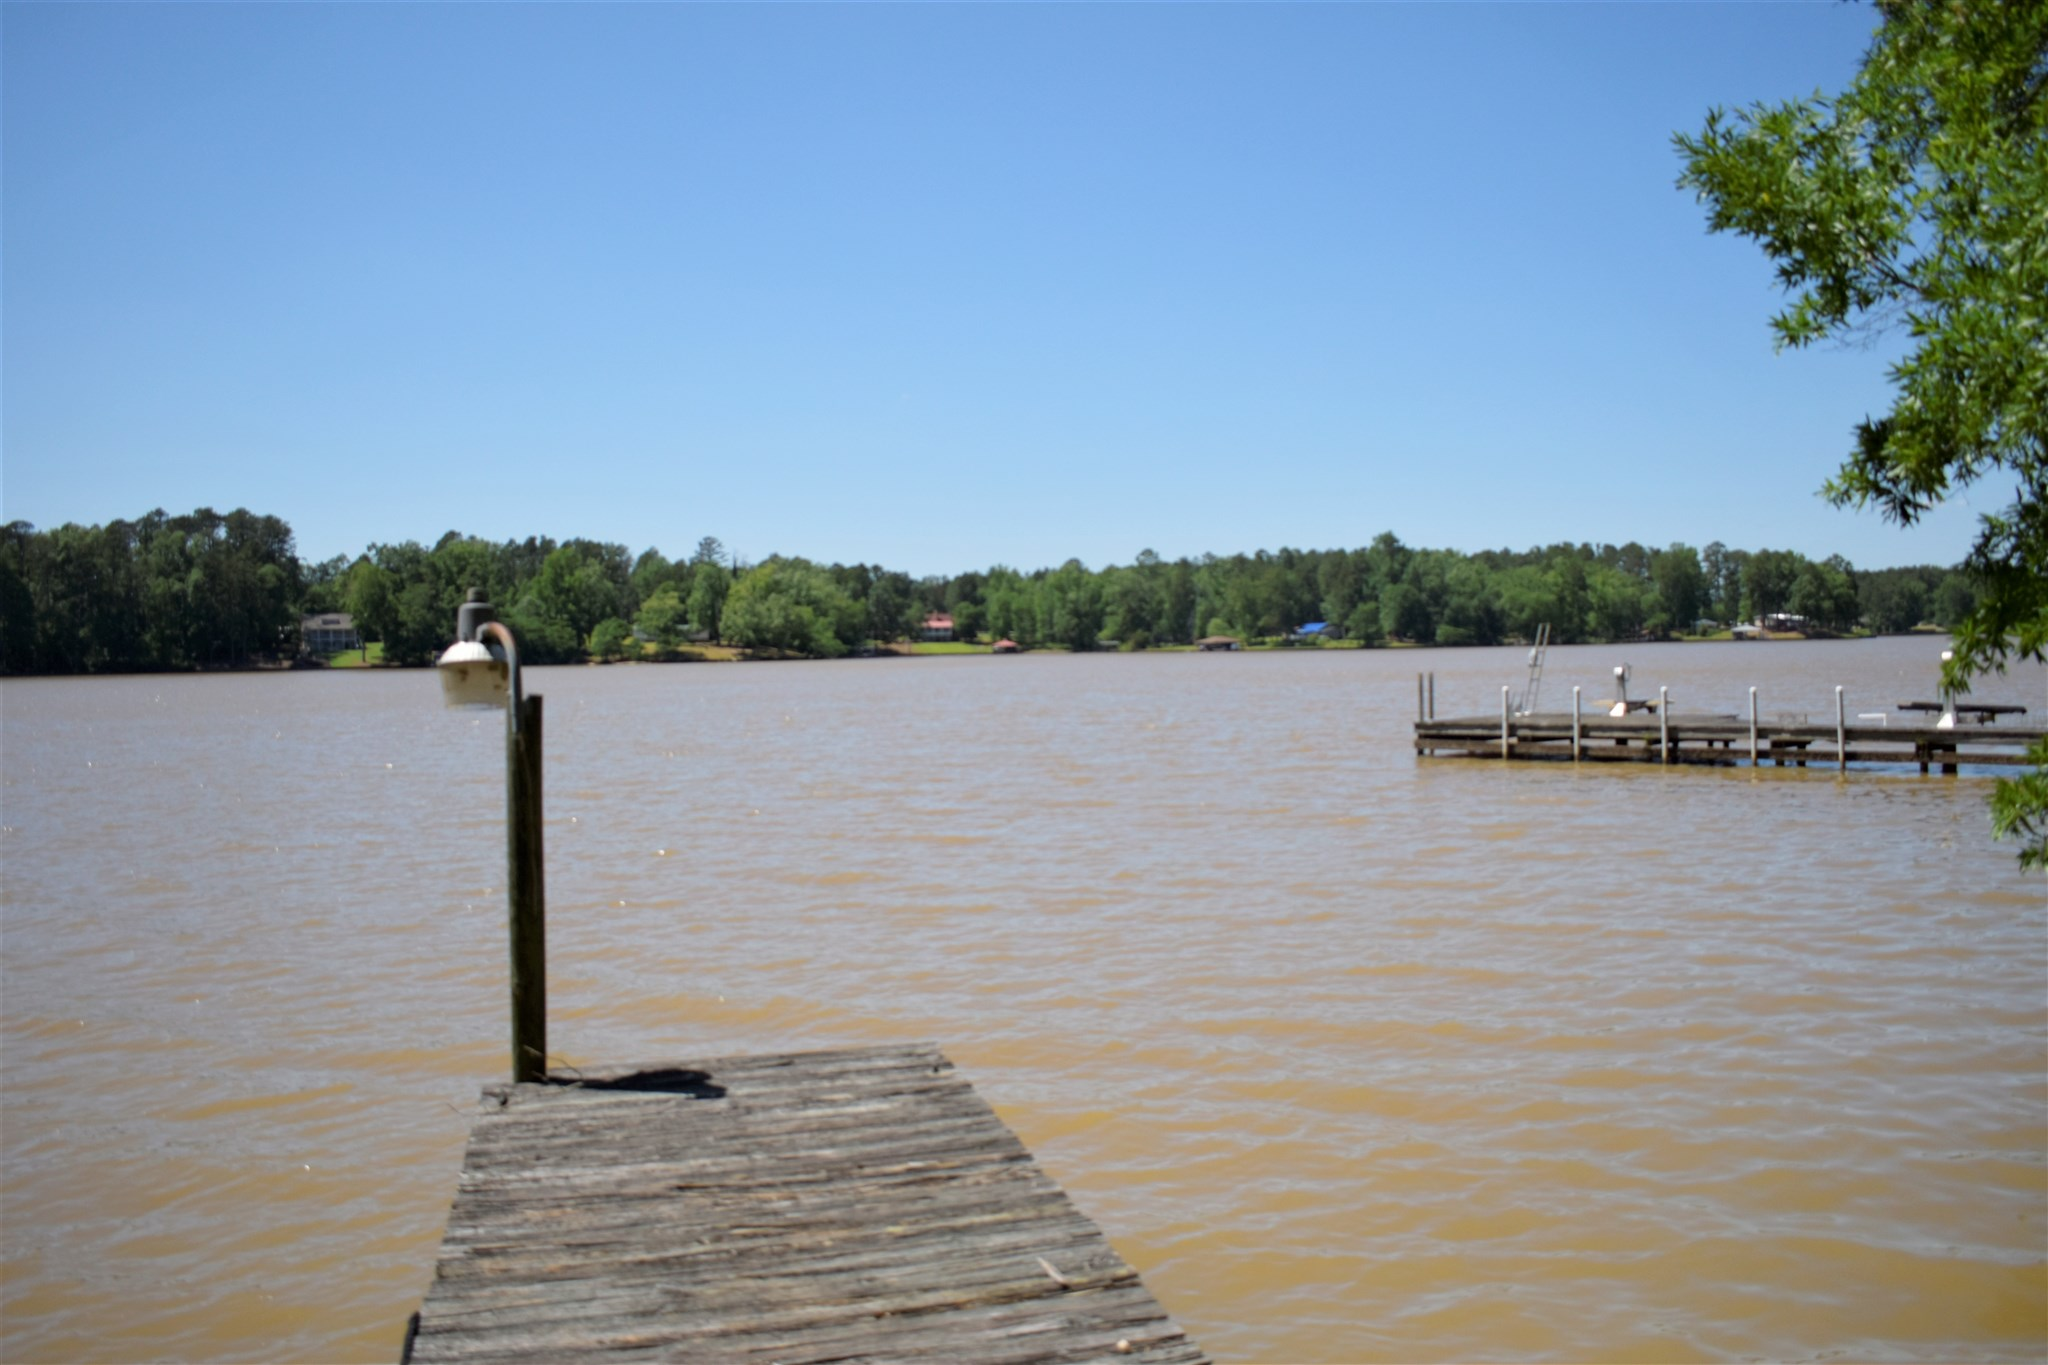 71 JESSICA ROAD, Lake Sinclair, Georgia